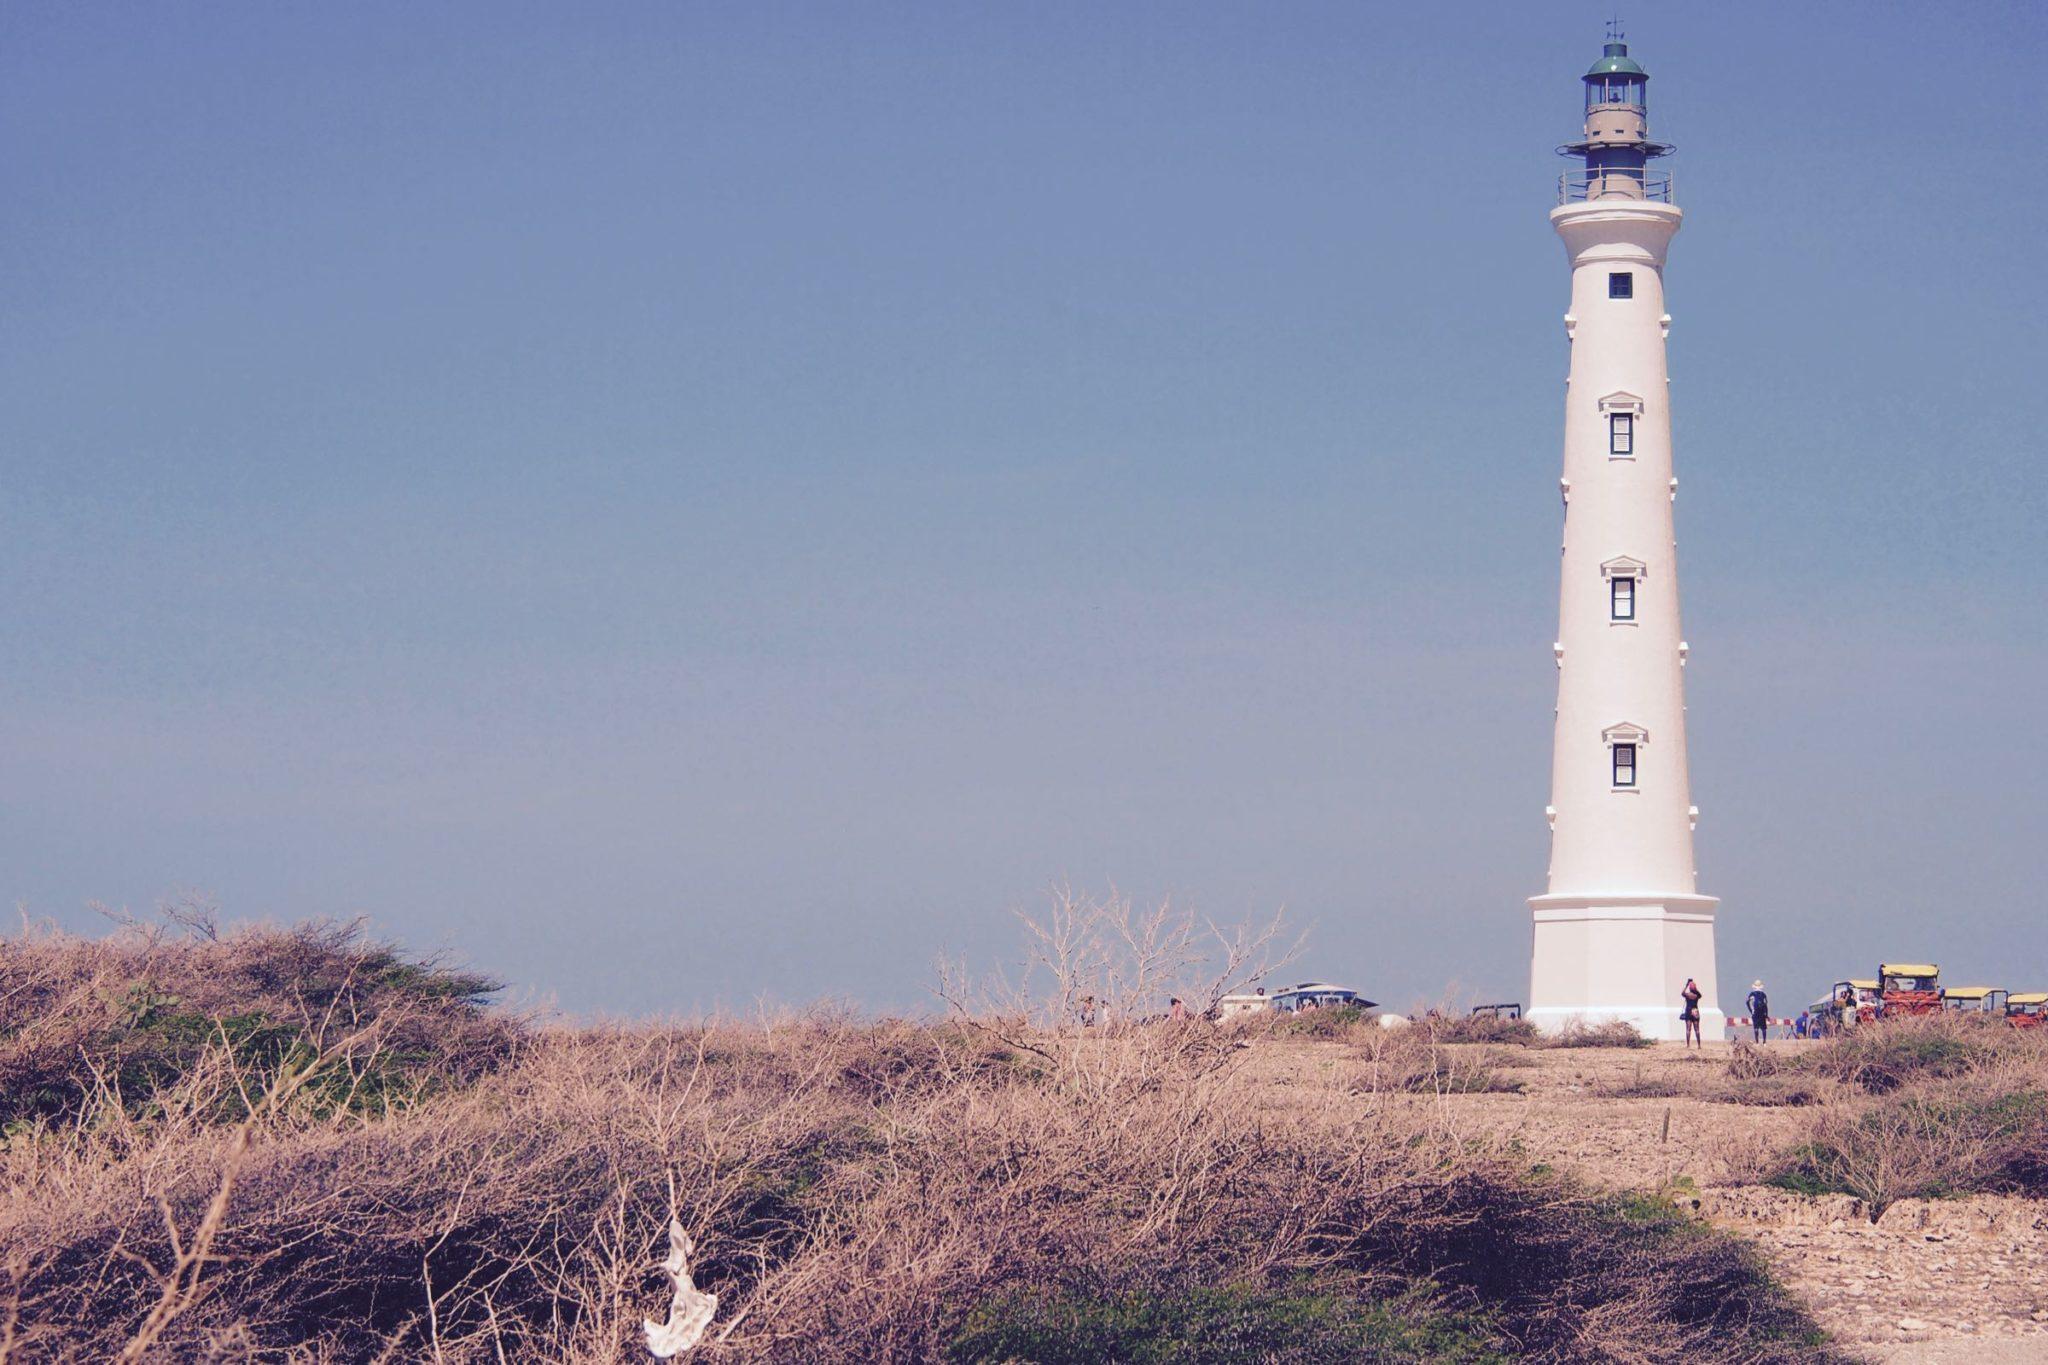 Aruba's California Lighthouse Fantastically French